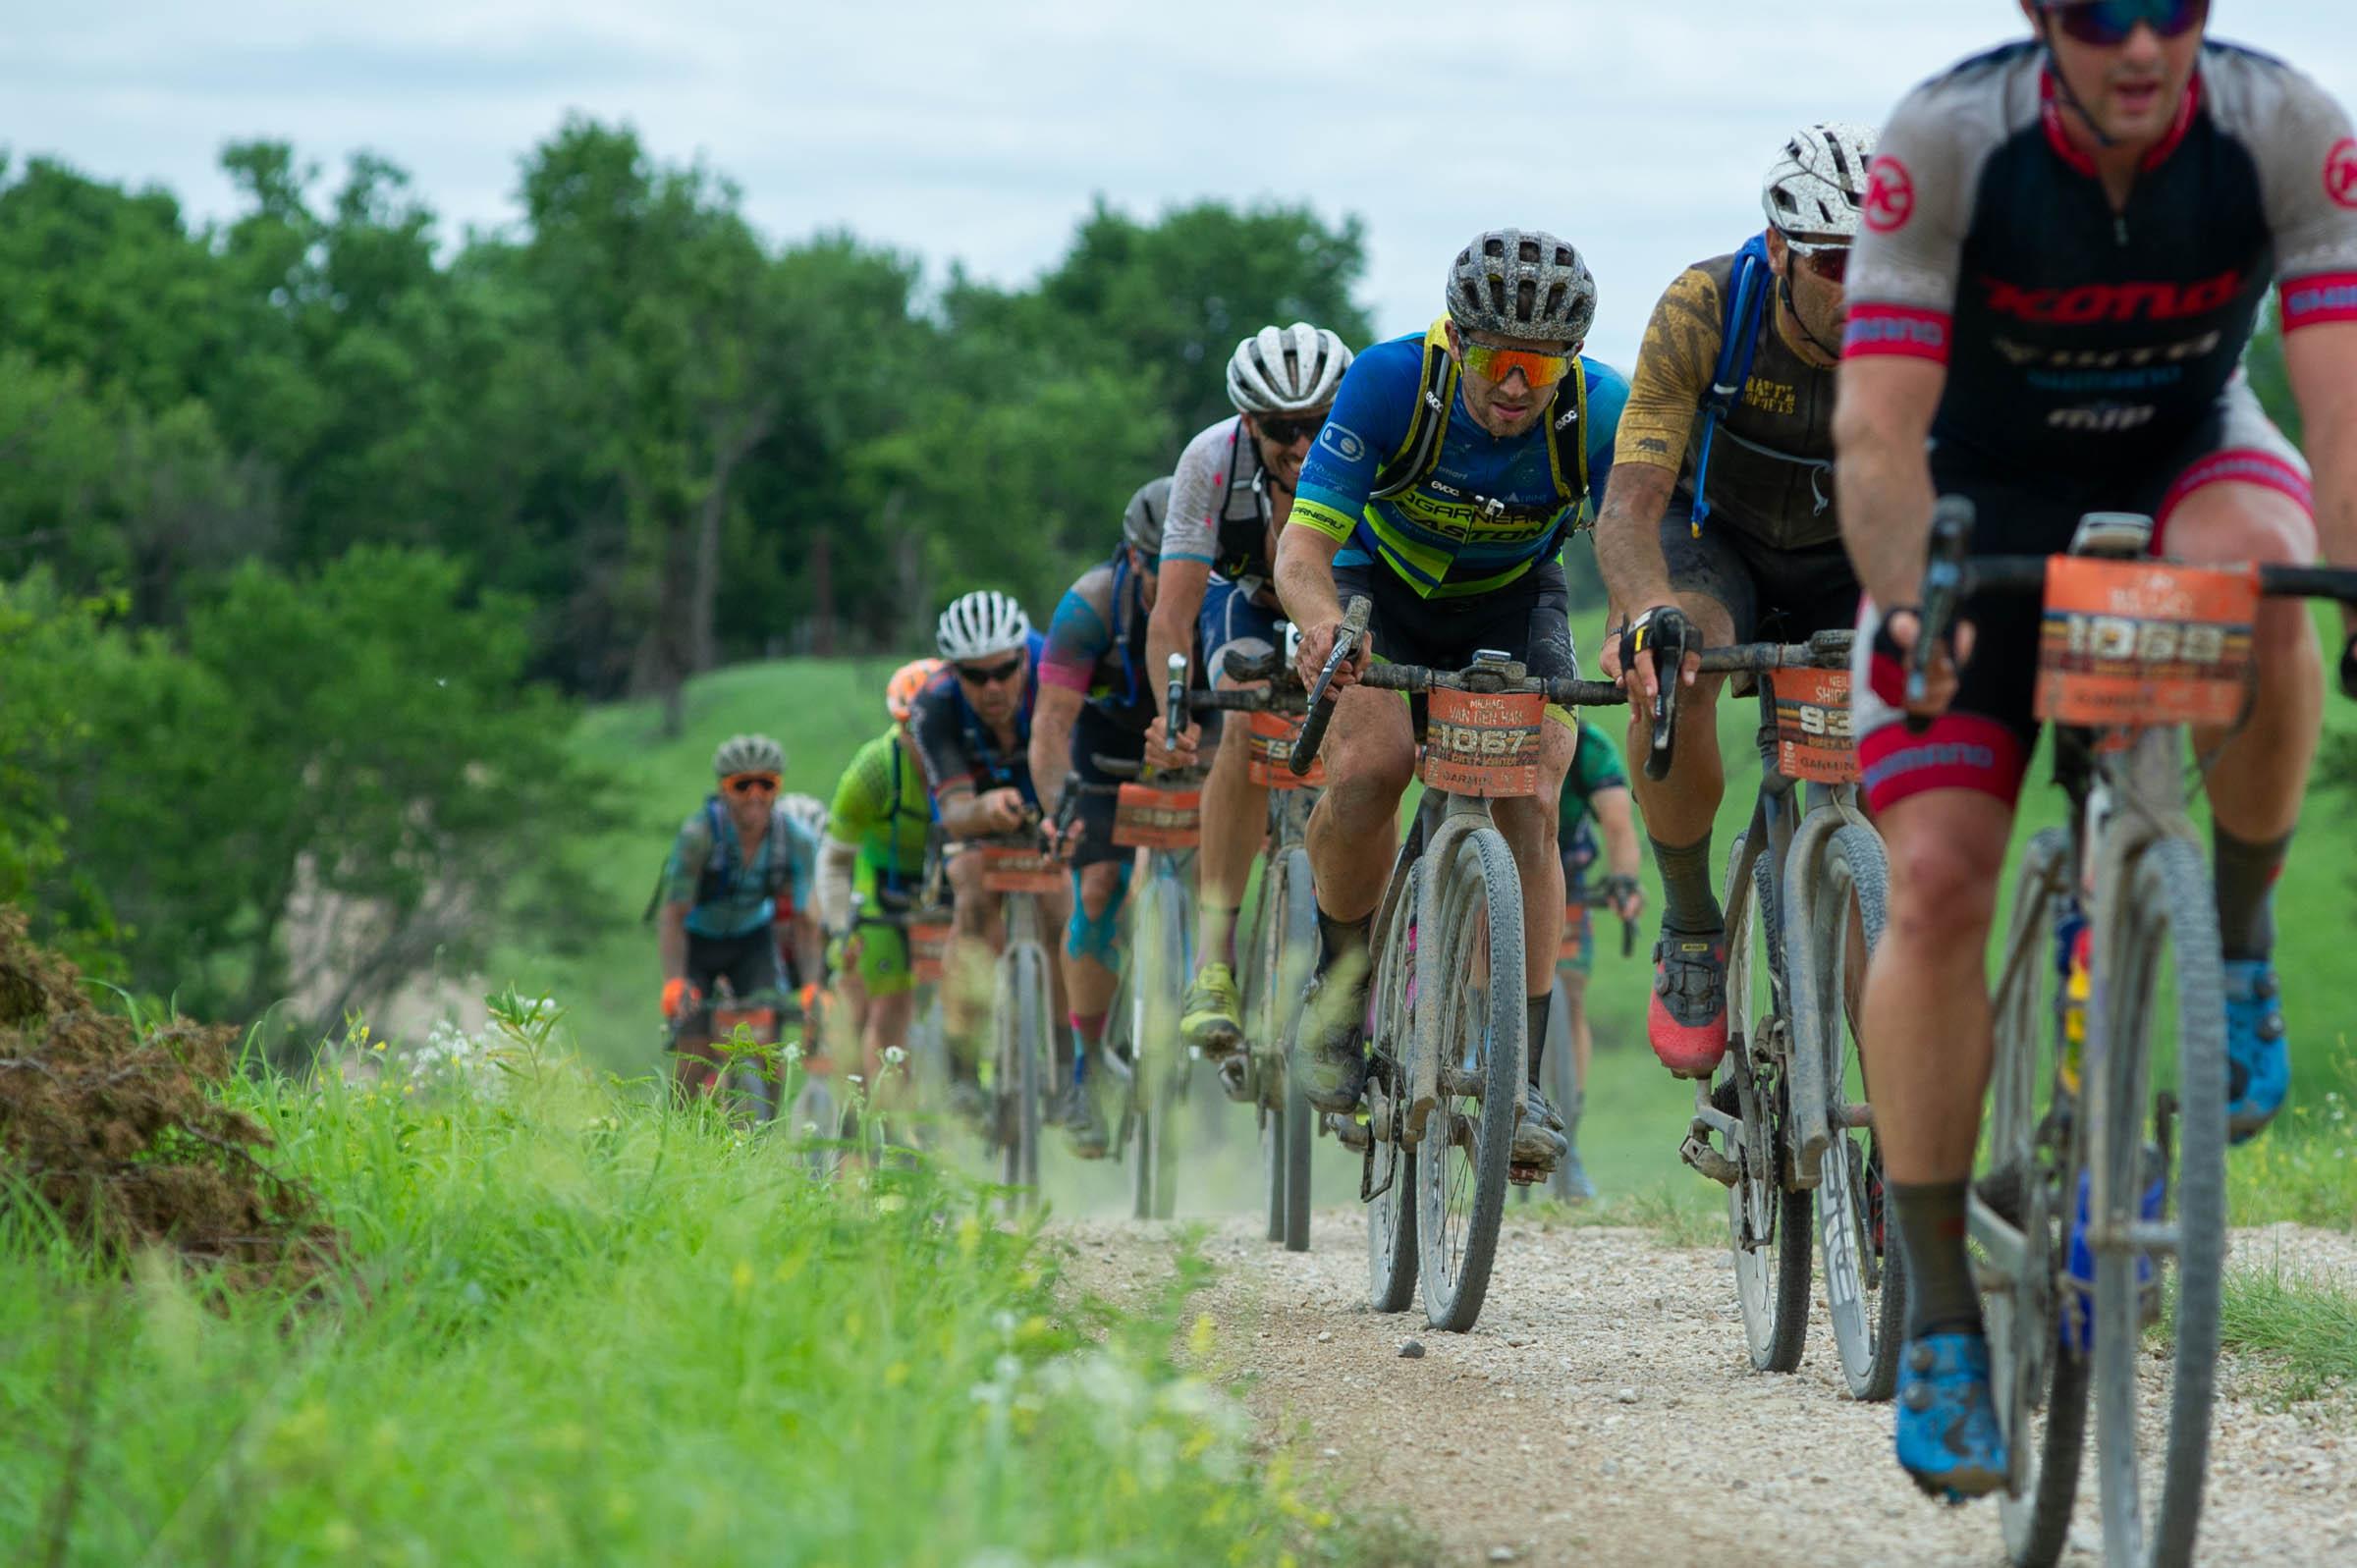 Michael van den Ham races Dirty Kanza 200. Photo Ethan Glading.